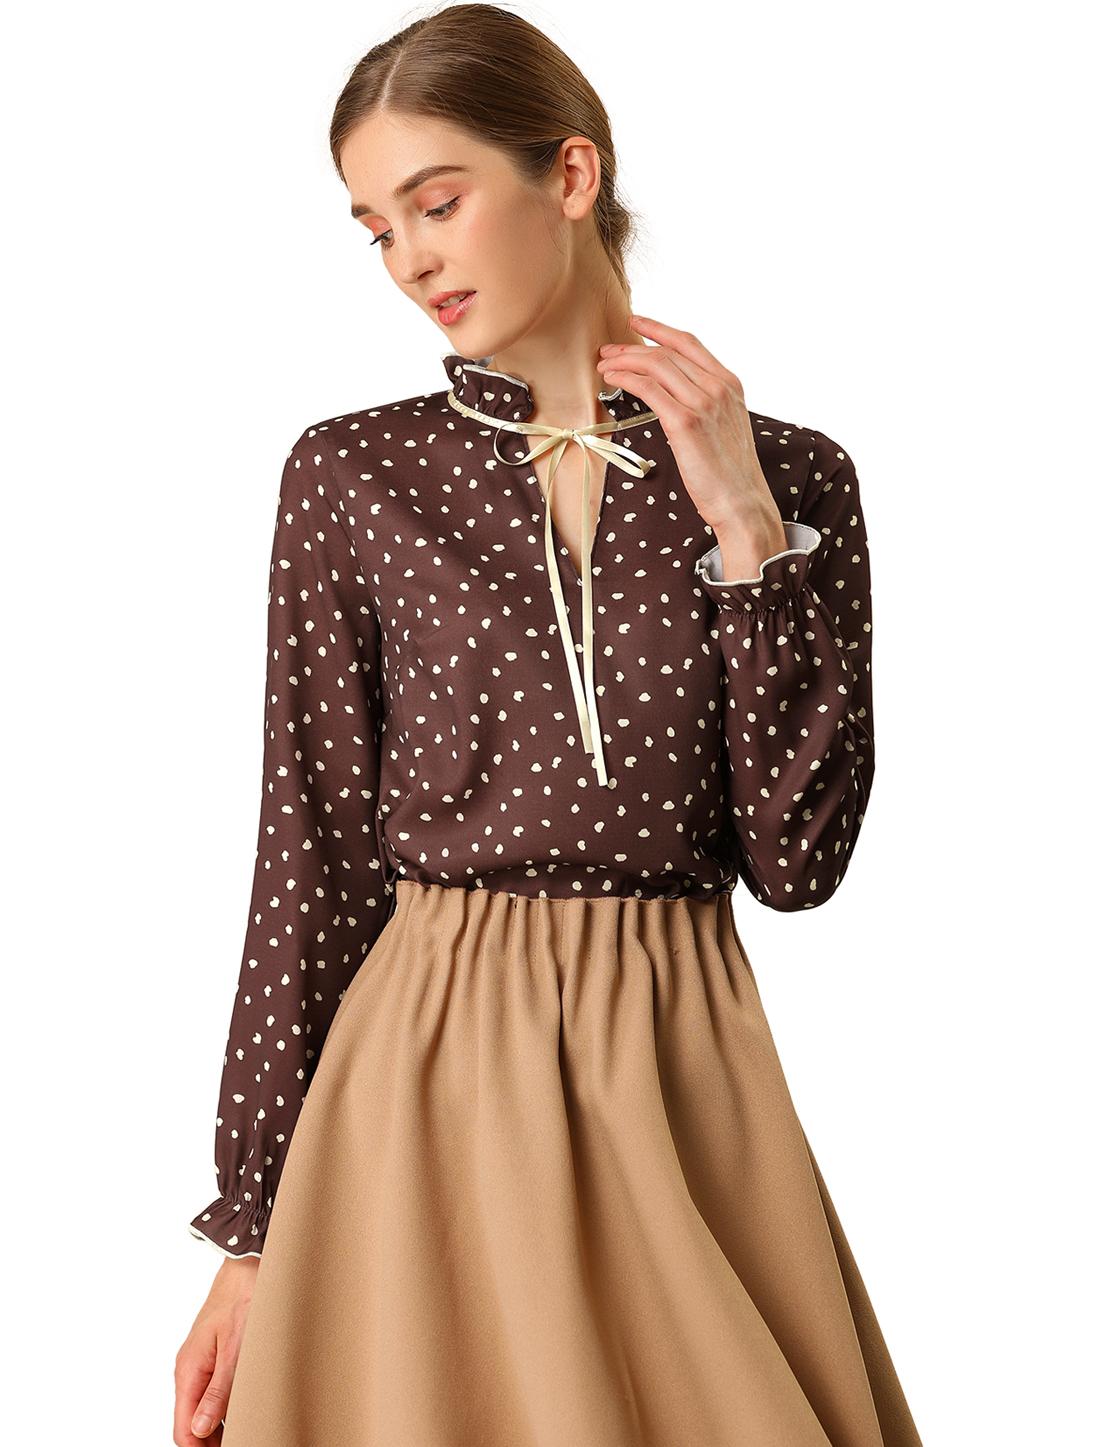 Allegra K Women's Tie Ruffled Neck Polka Dots Blouse Tops Maroon Red XS